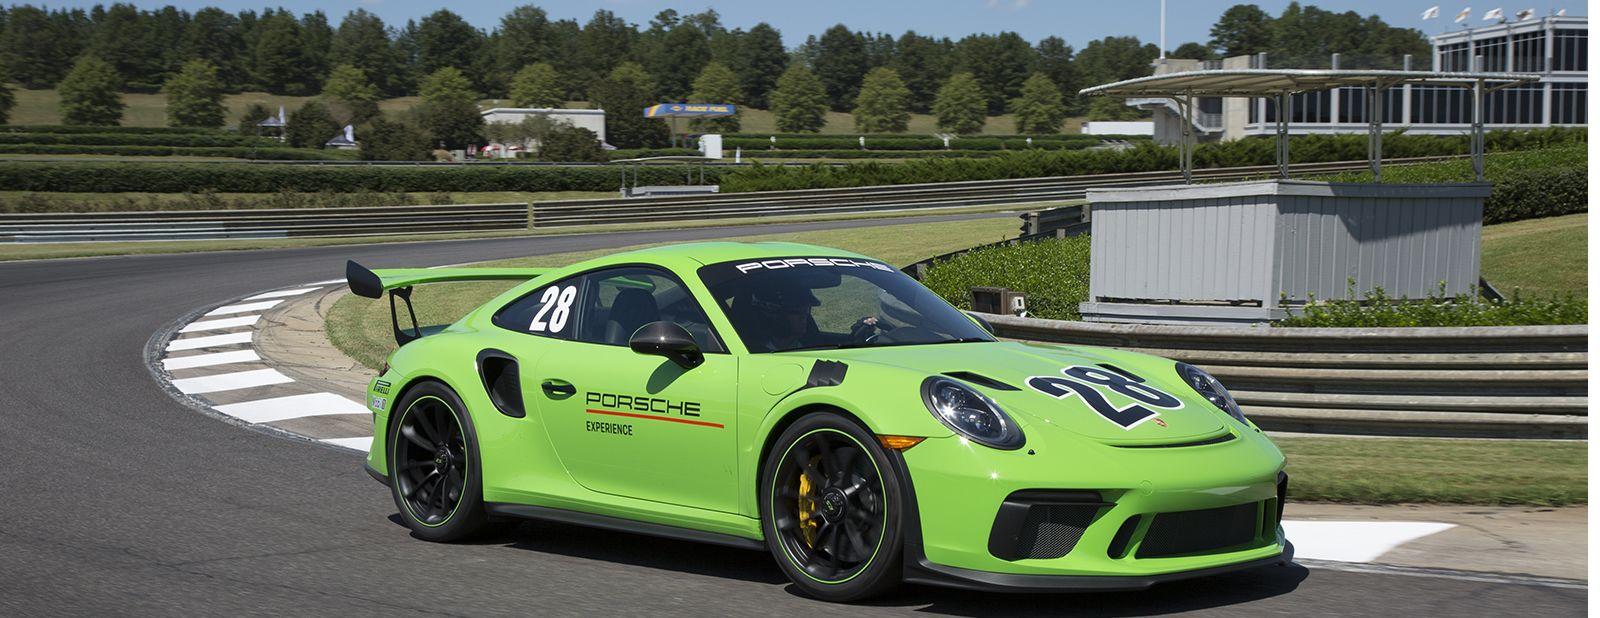 Porsche Driving Experience Porsche Track Experience Porsche Driving Experience Porsche Driving Experience